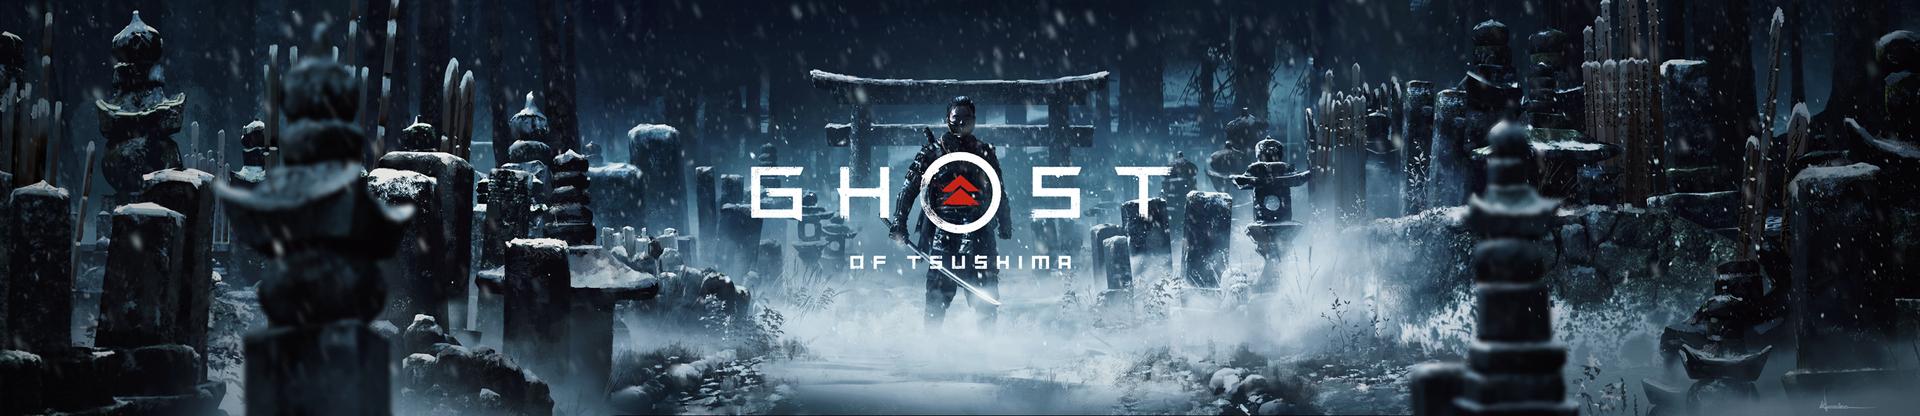 Ghost of Tsushima Key Art by iancjw